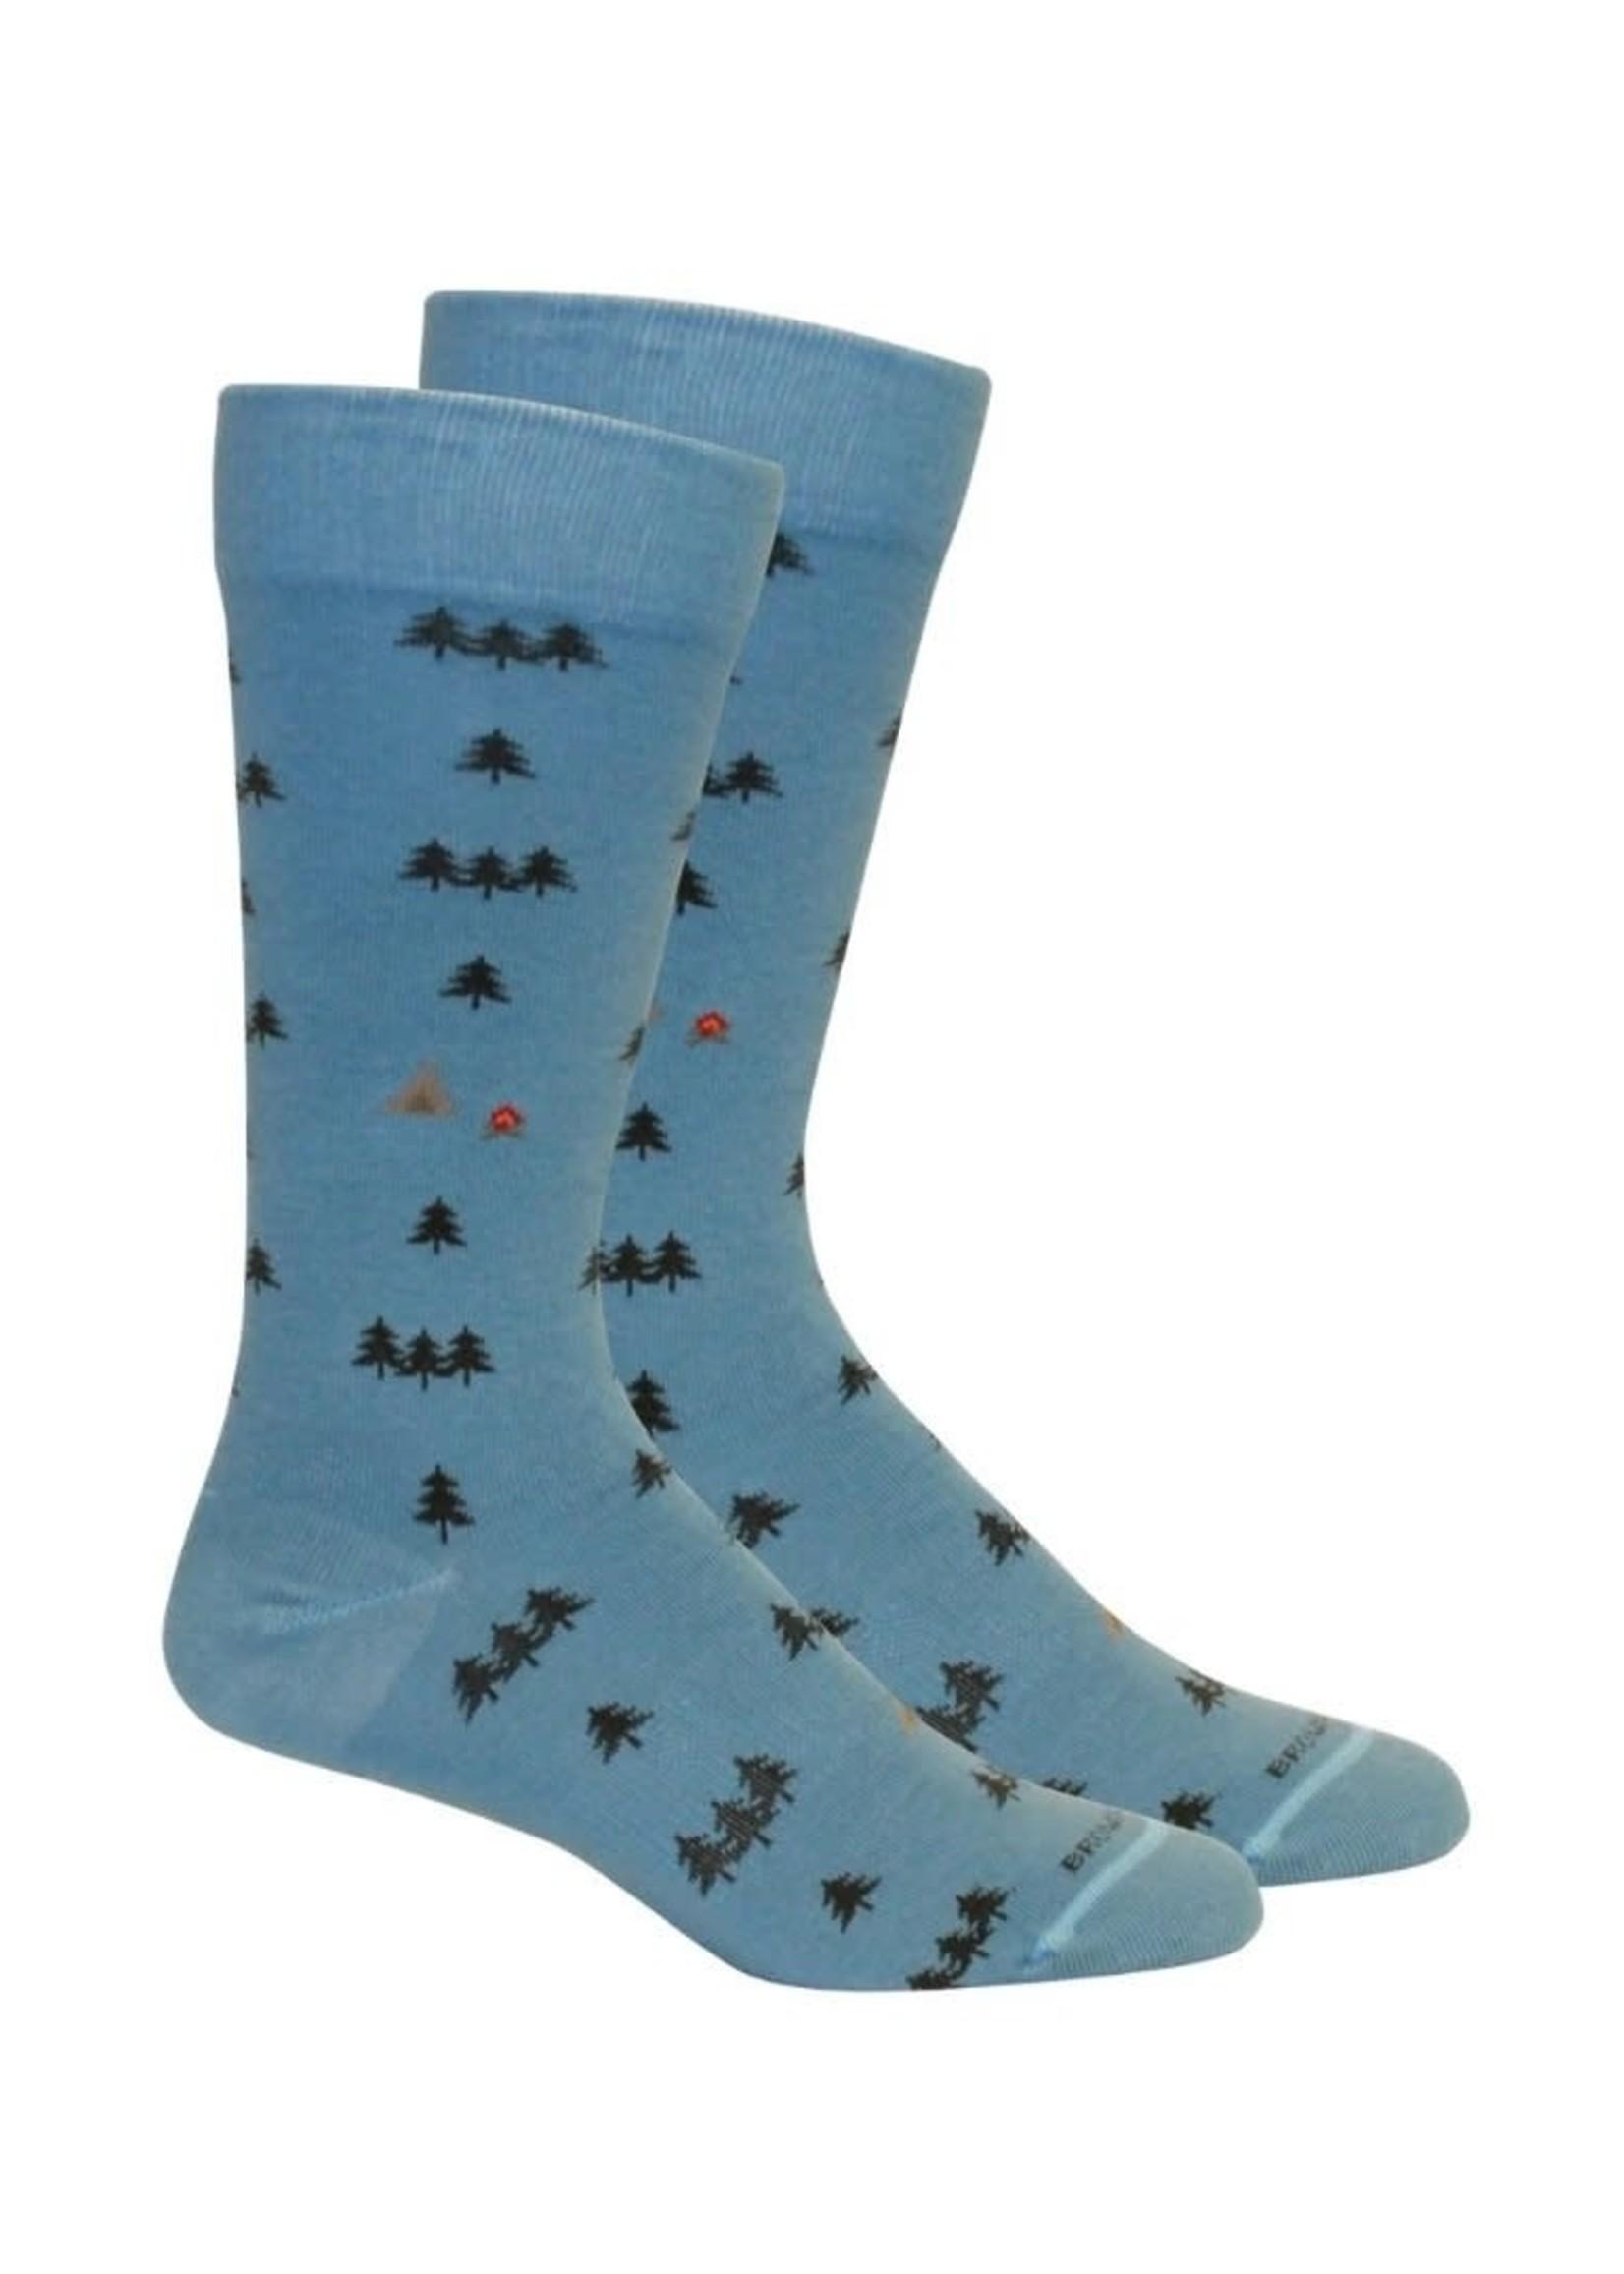 Get Lost Socks